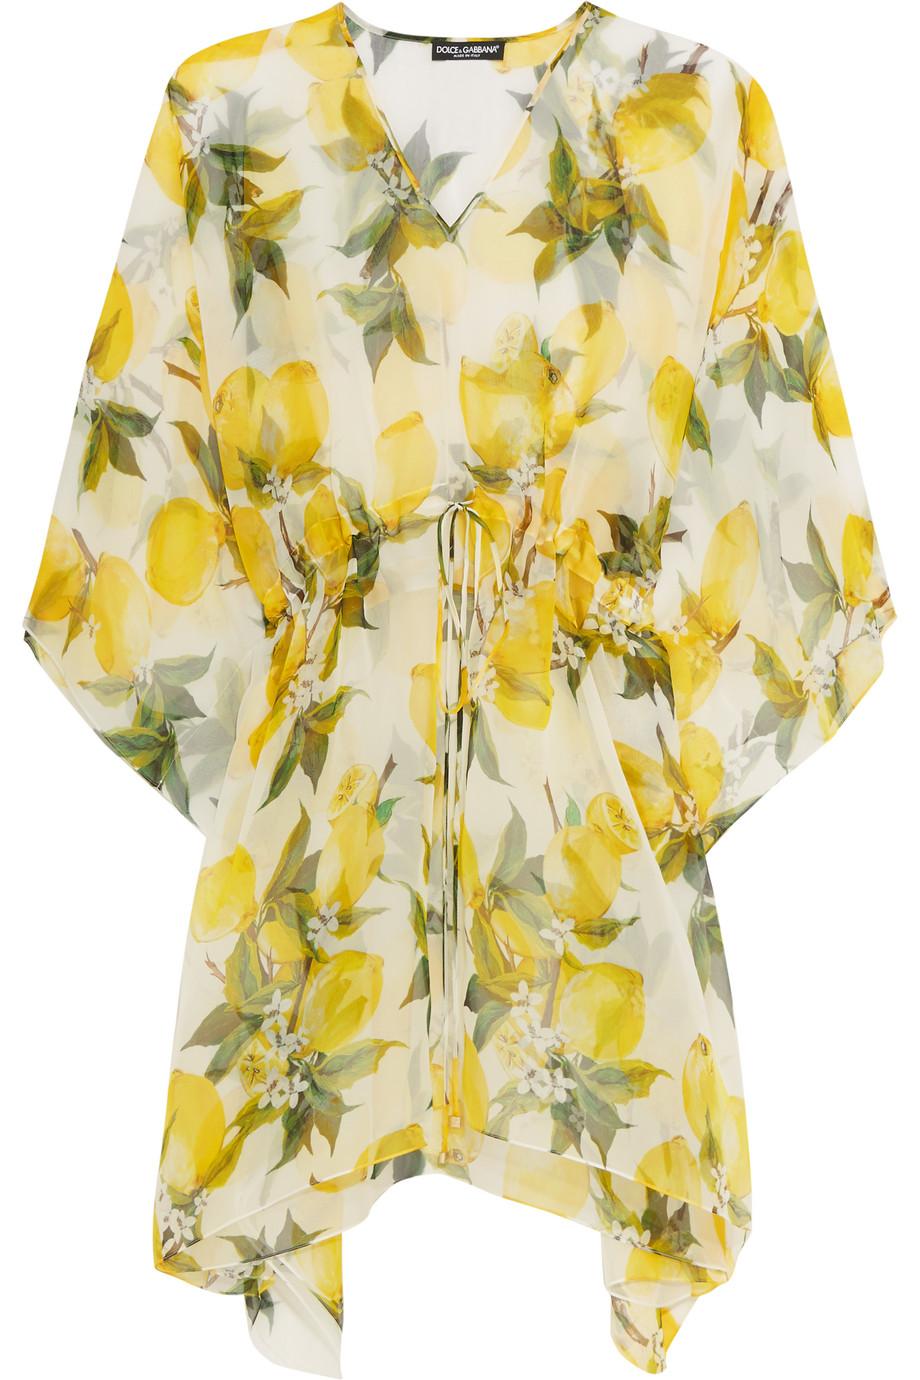 Dolce & Gabbana Printed Silk-Chiffon Kaftan, Yellow, Women's - Printed, Size: 38